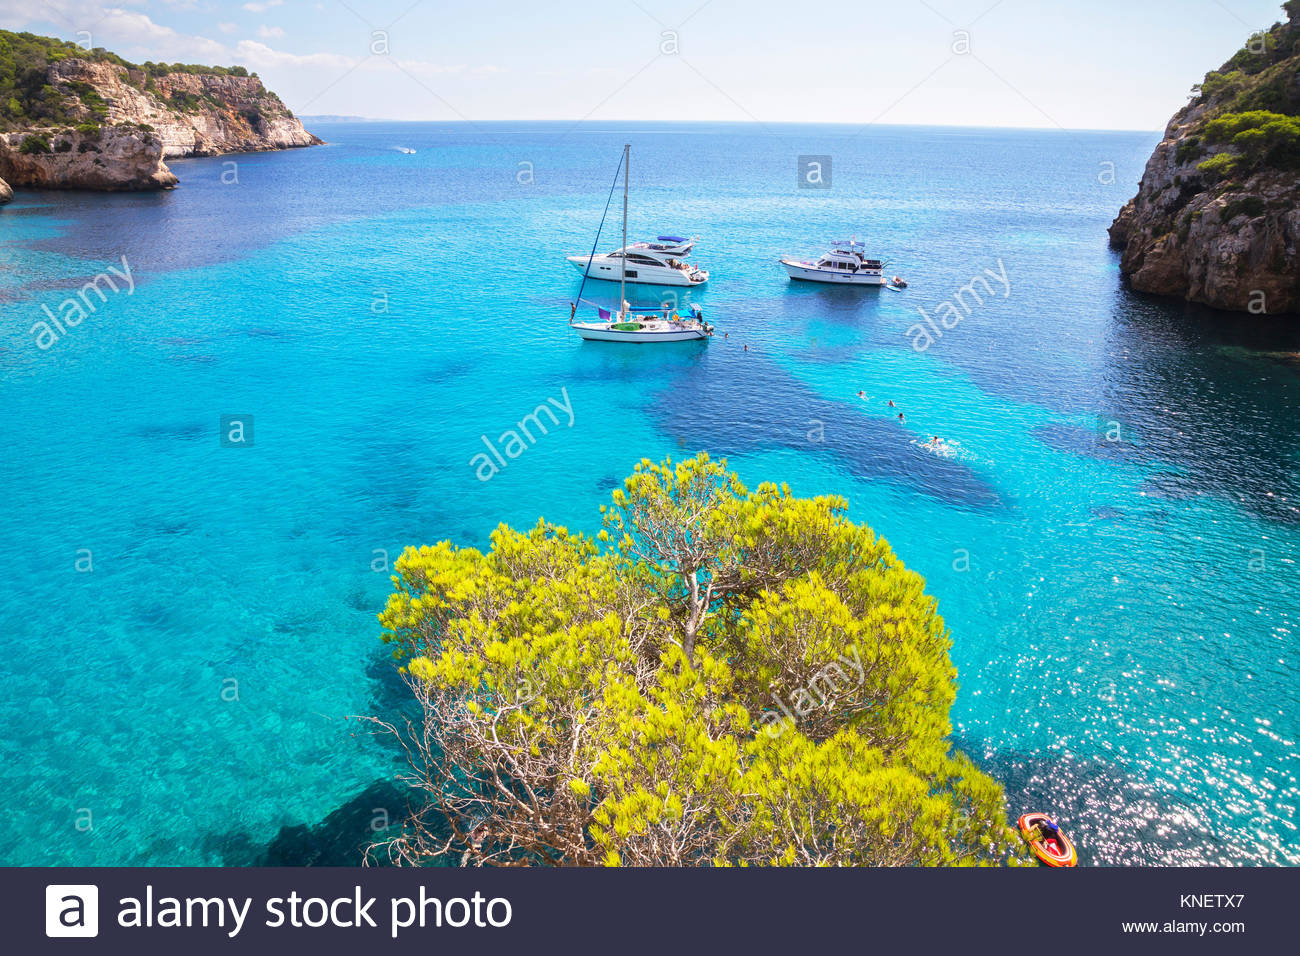 View of yachts anchored in blue sea at Cala Mitjana bay, Menorca, Balearic Islands, Spain - Stock Image